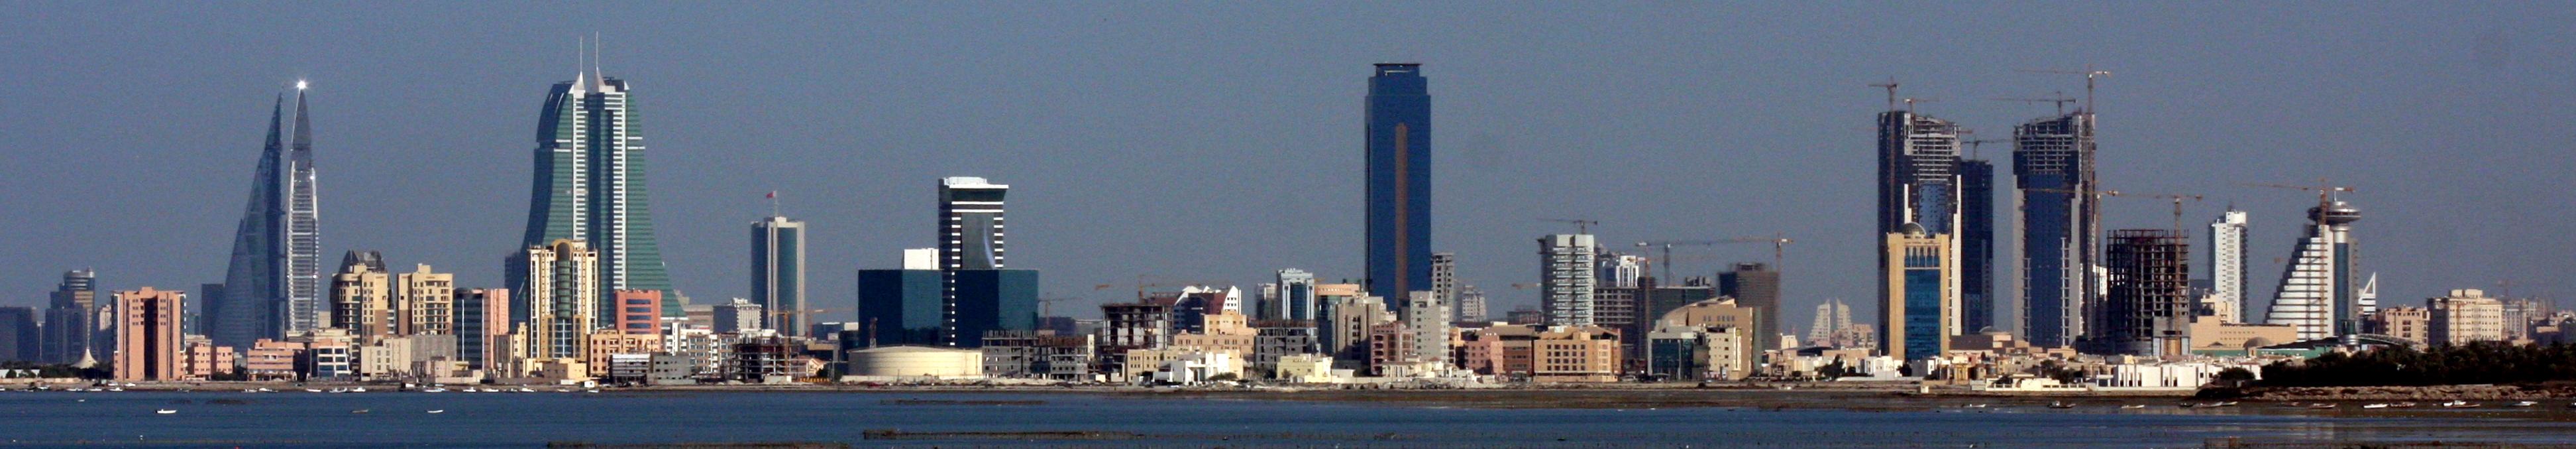 File:Manama Skyline.jpg - Wikimedia Commons